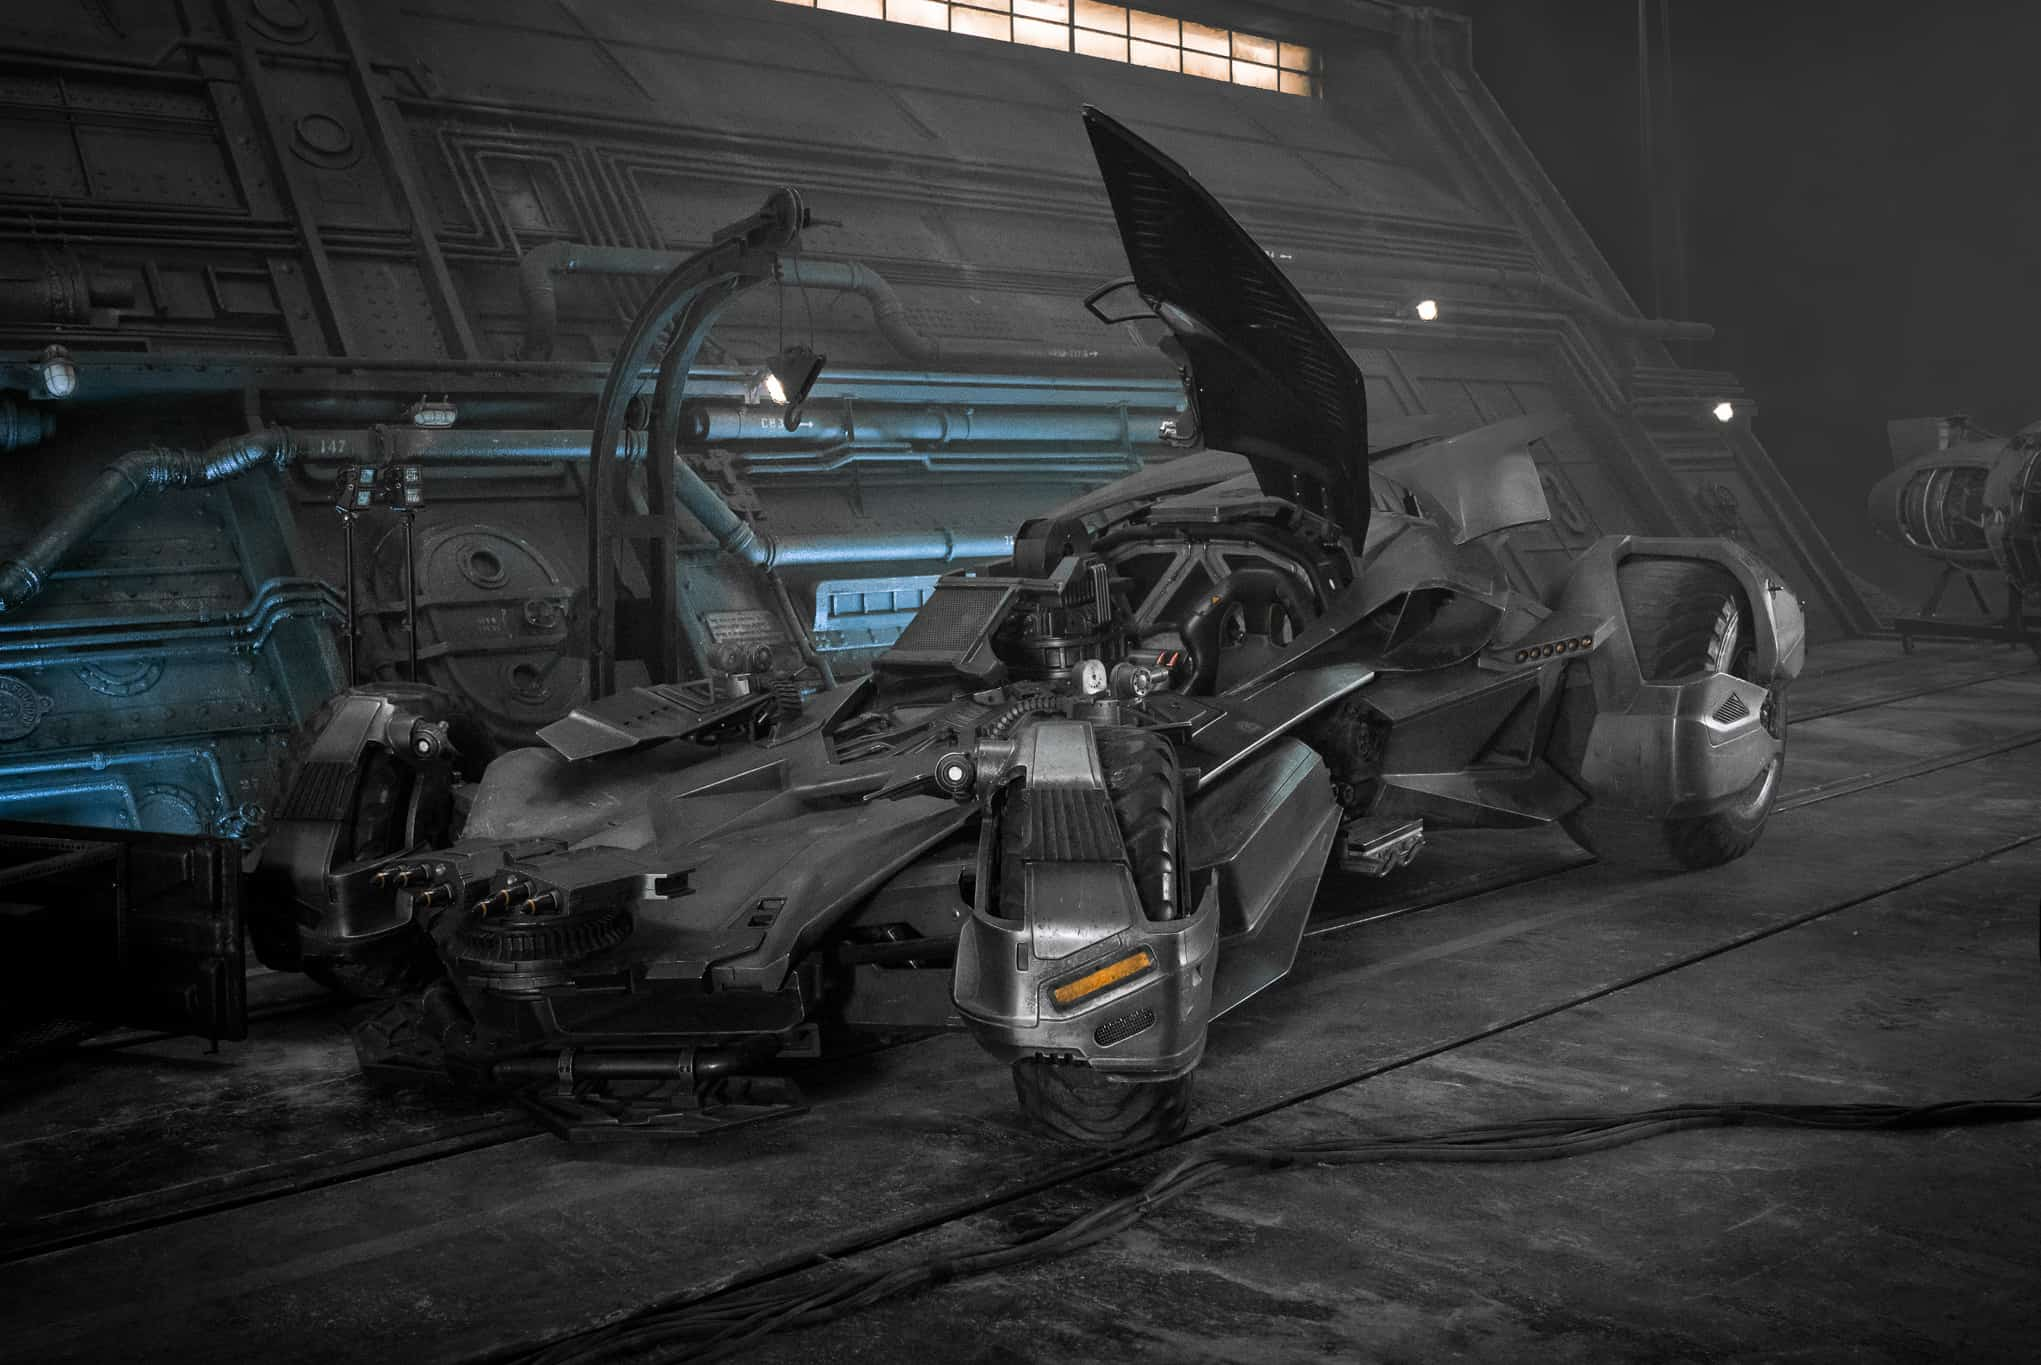 Justice League Batman Batmobile